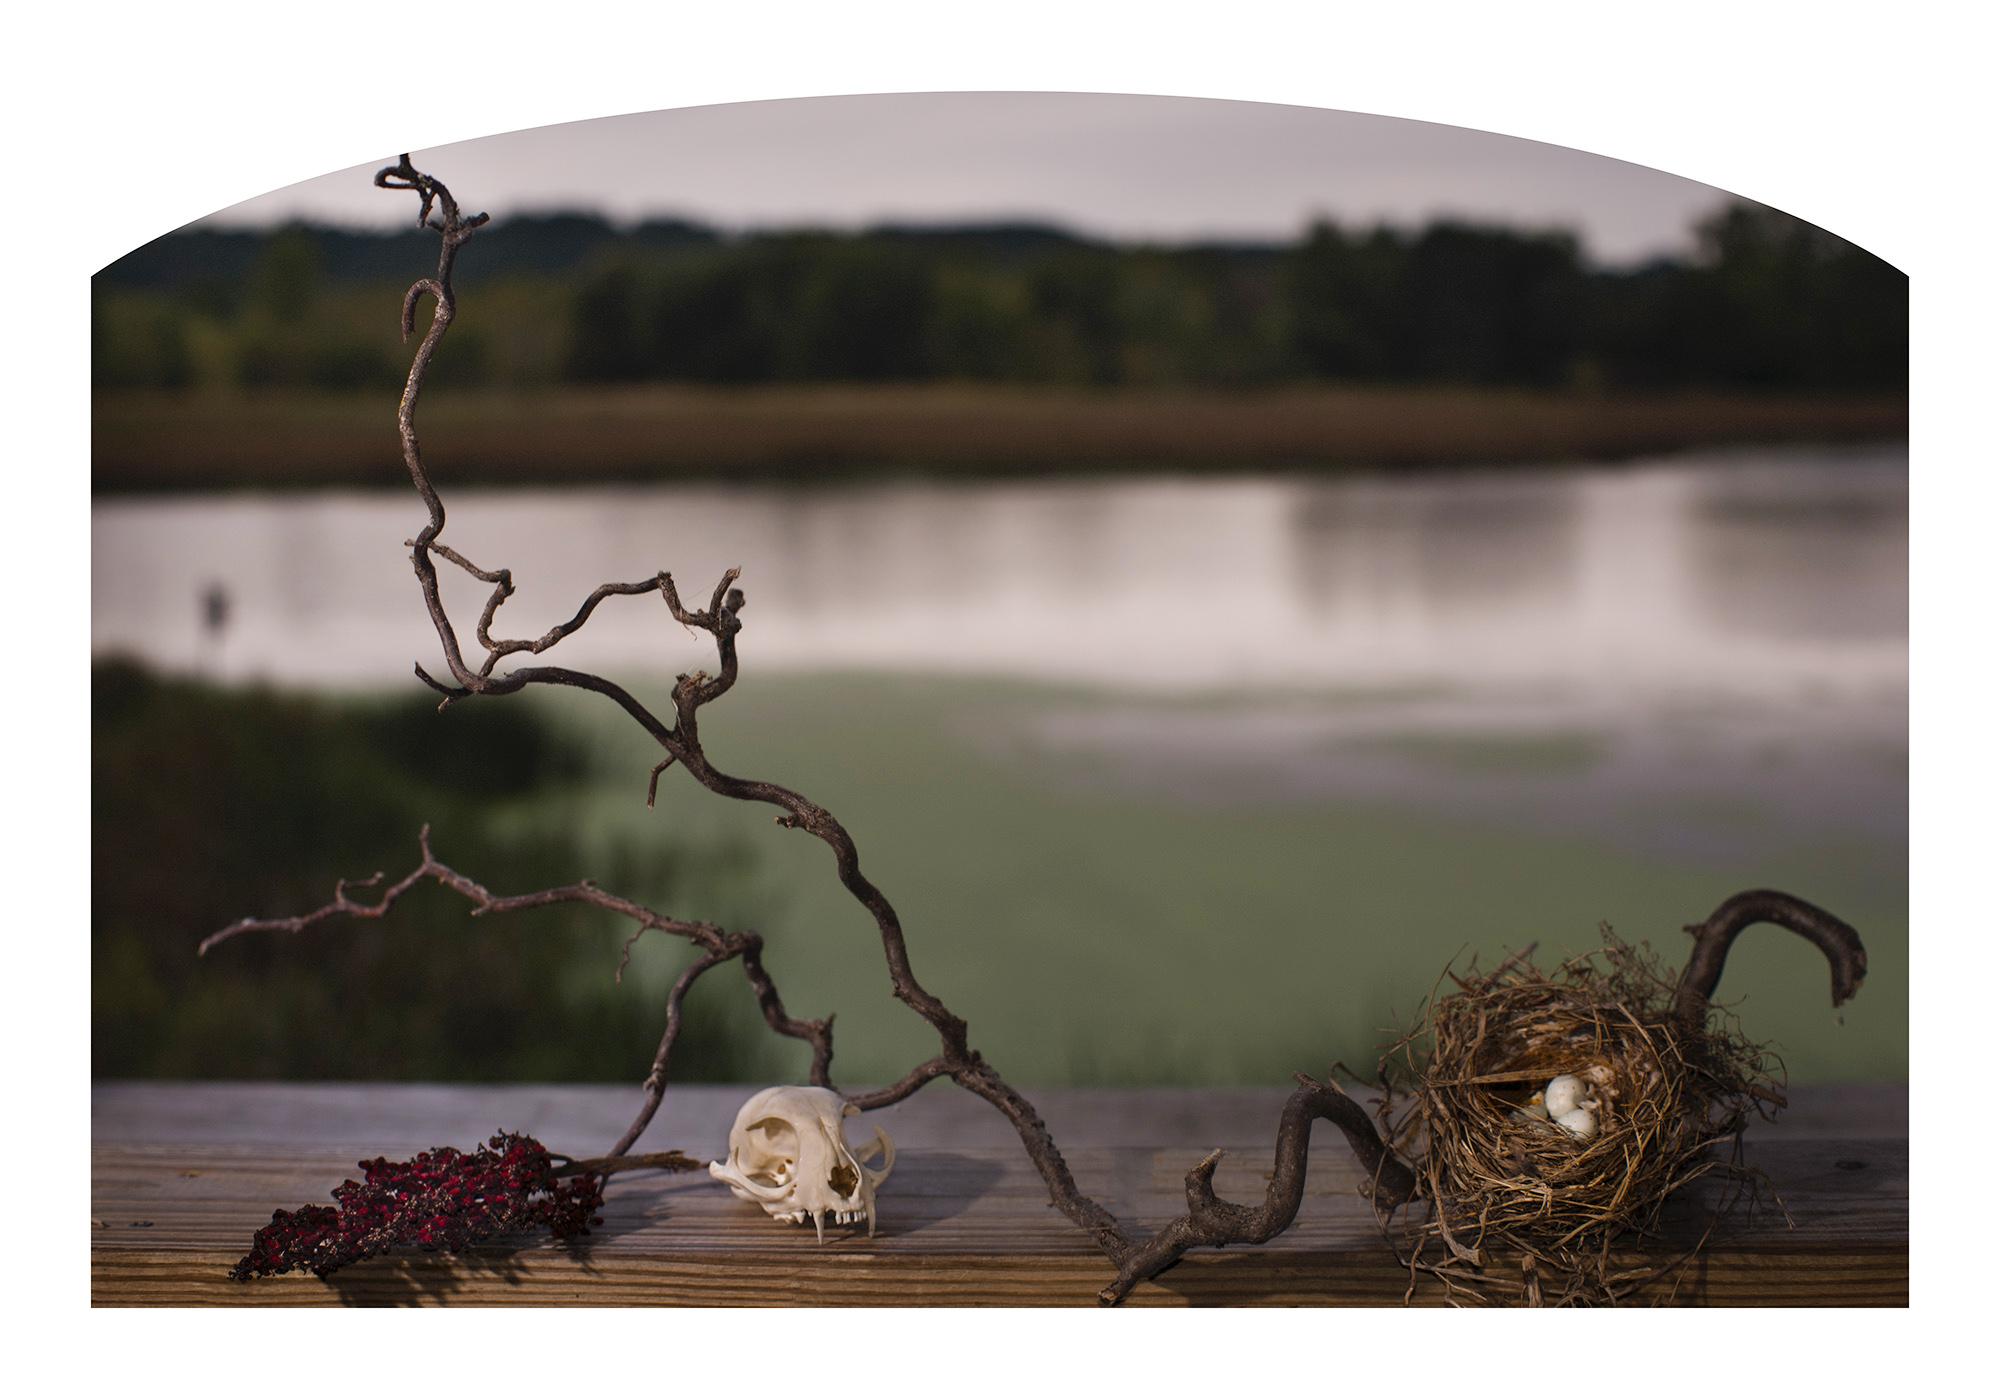 title: 10/03/2017 8:20 AM  image size: 36x24  paper size: 40x28  (Hahnemühle Bamboo)   archival pigment print